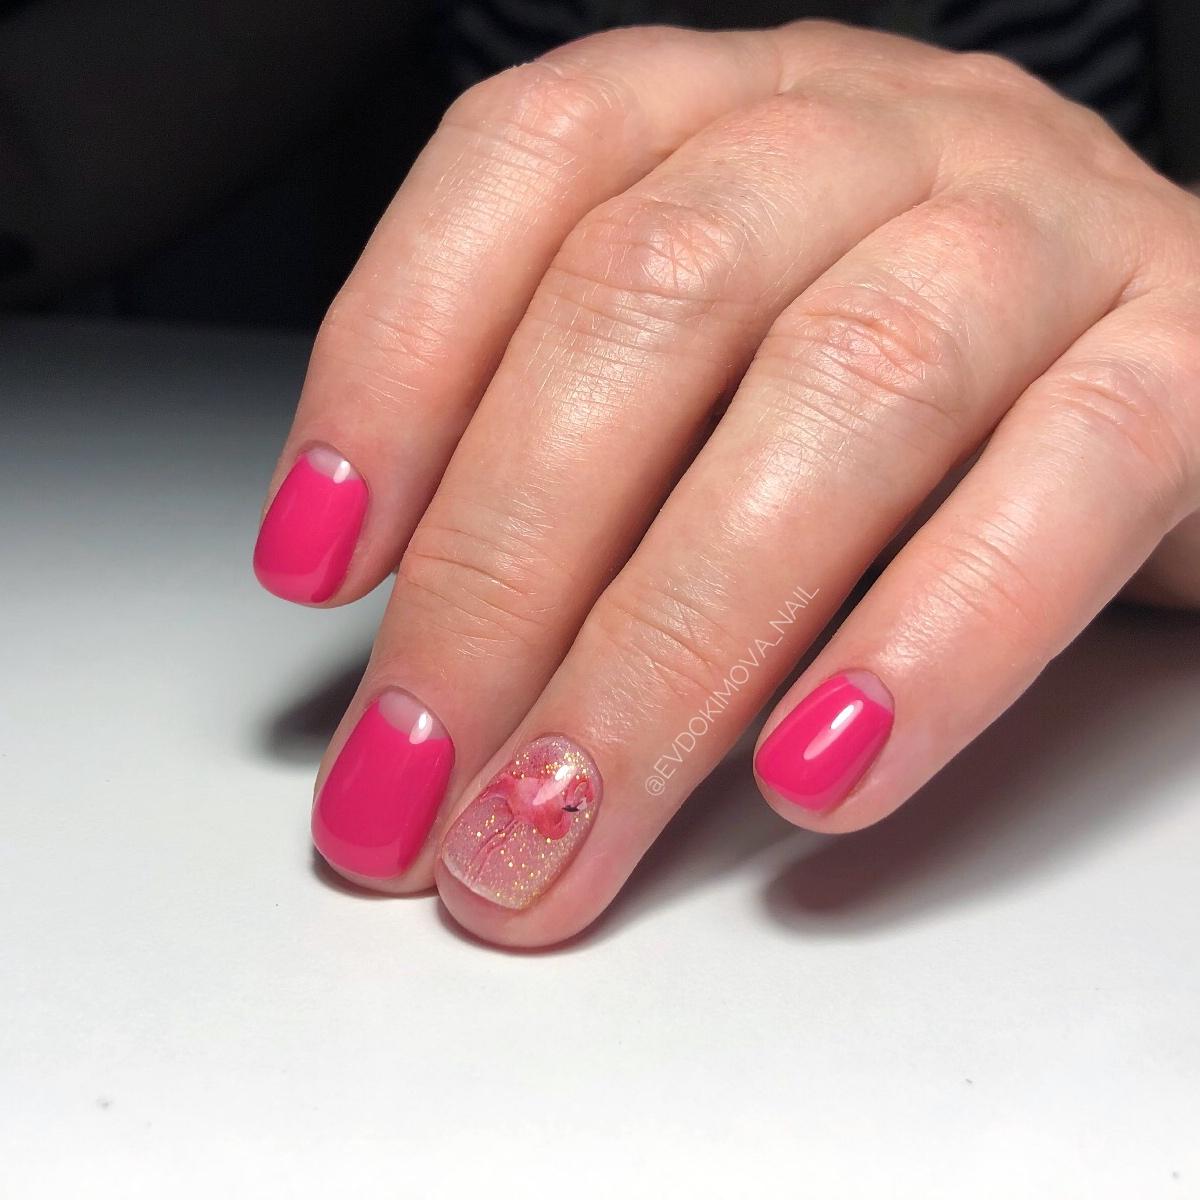 Лунный маникюр с фламинго в розовом цвете на короткие ногти.